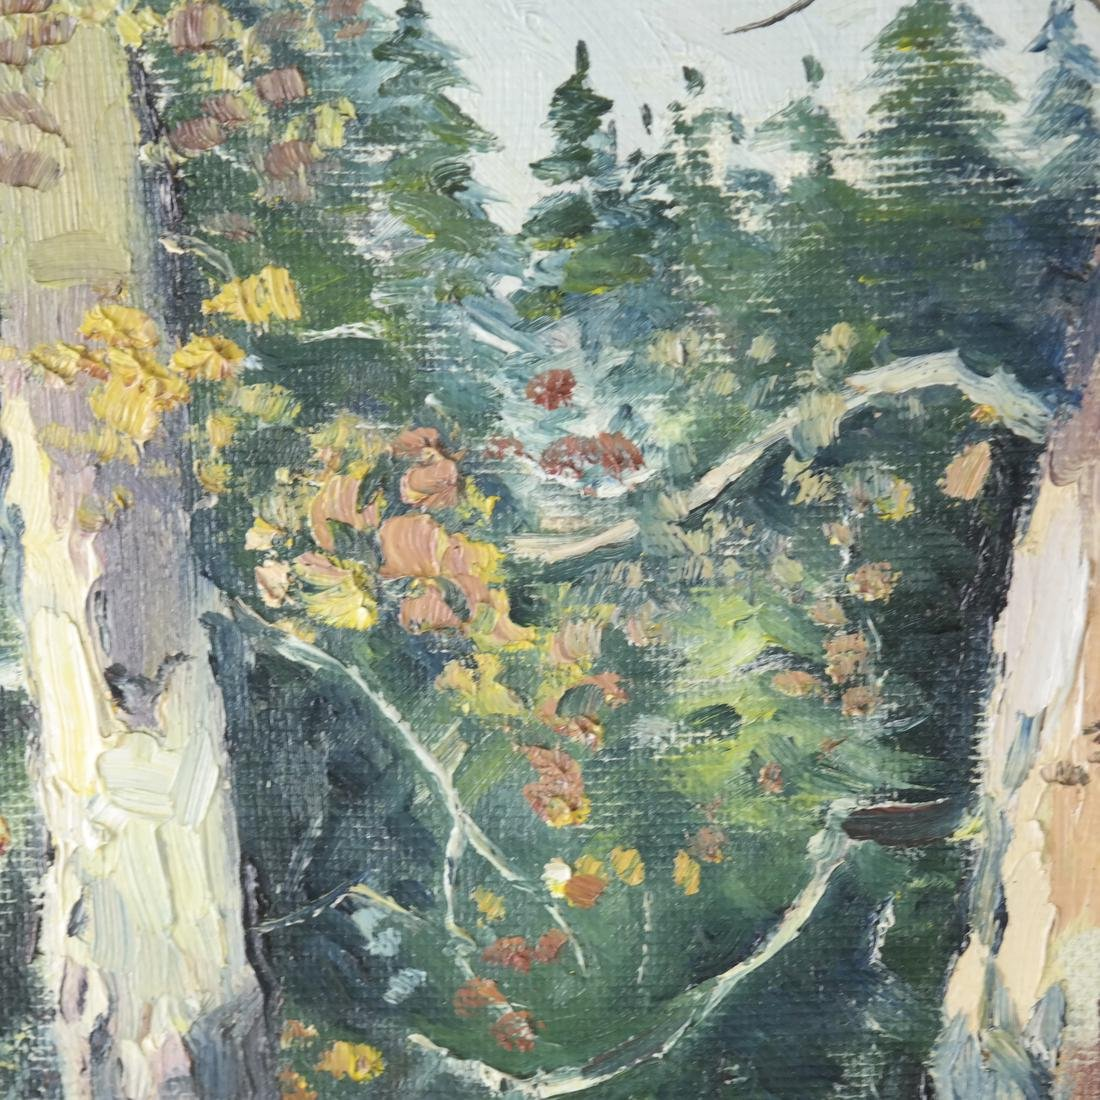 B. Benton, White Birch, Oil on Board - 4